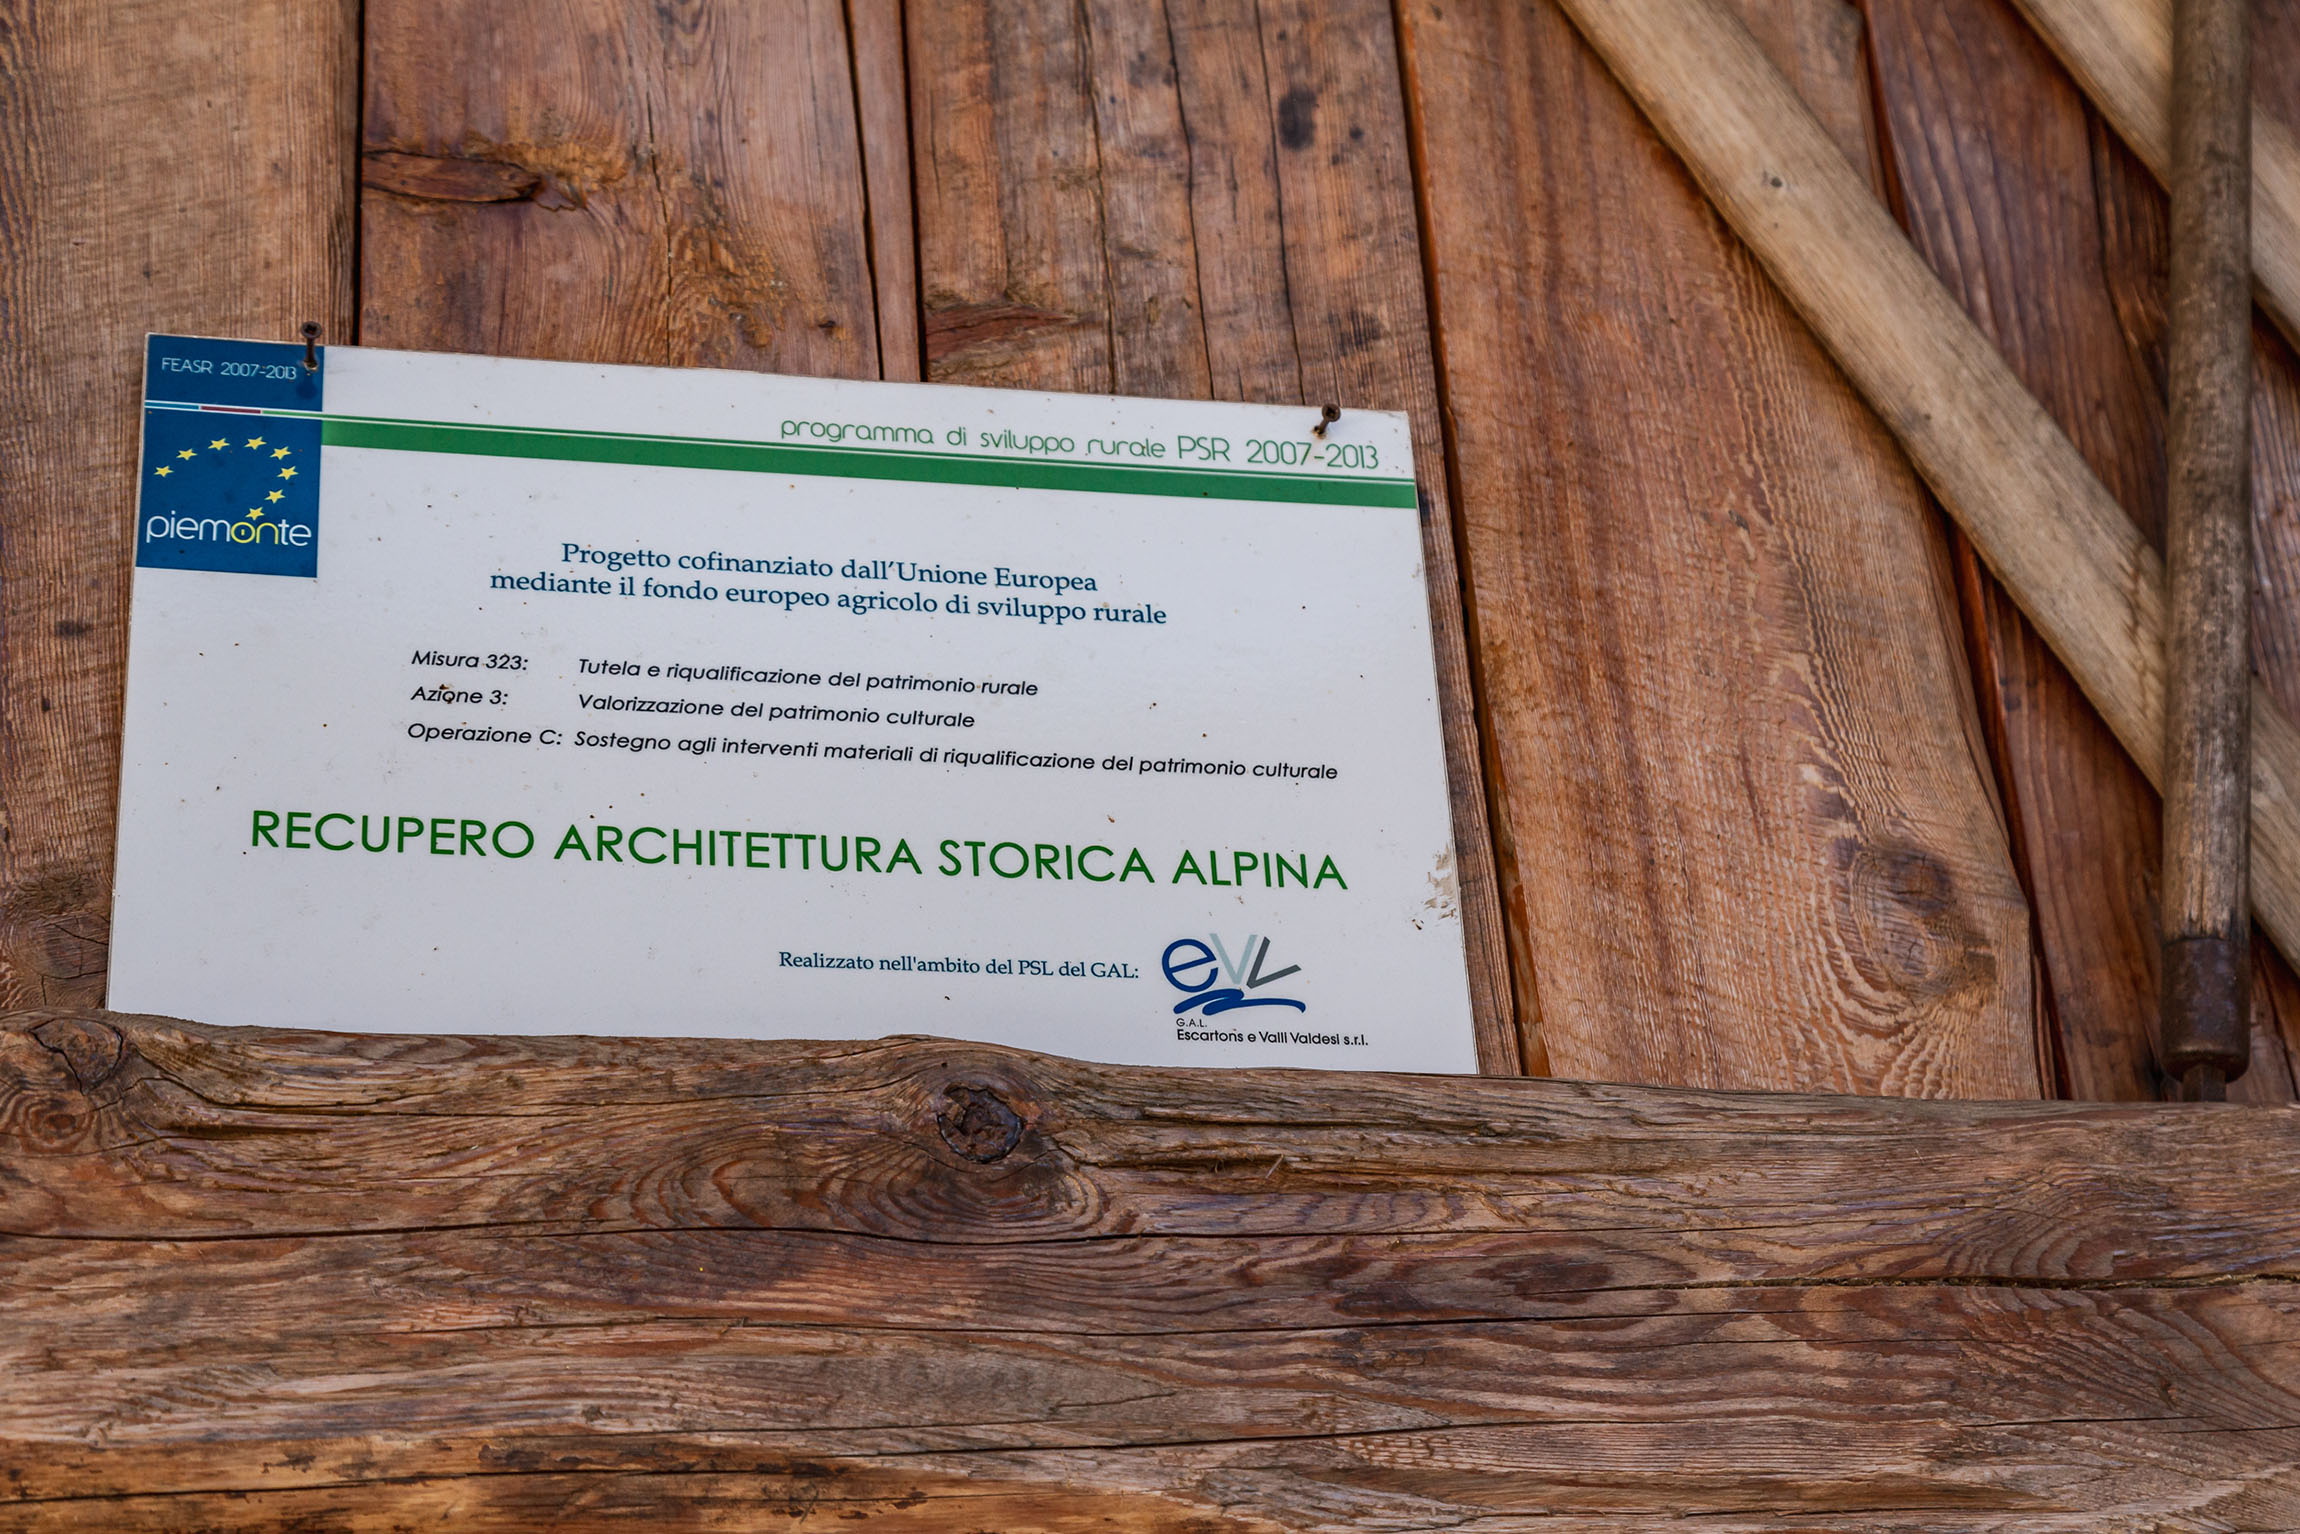 recupero architettura storica alpina